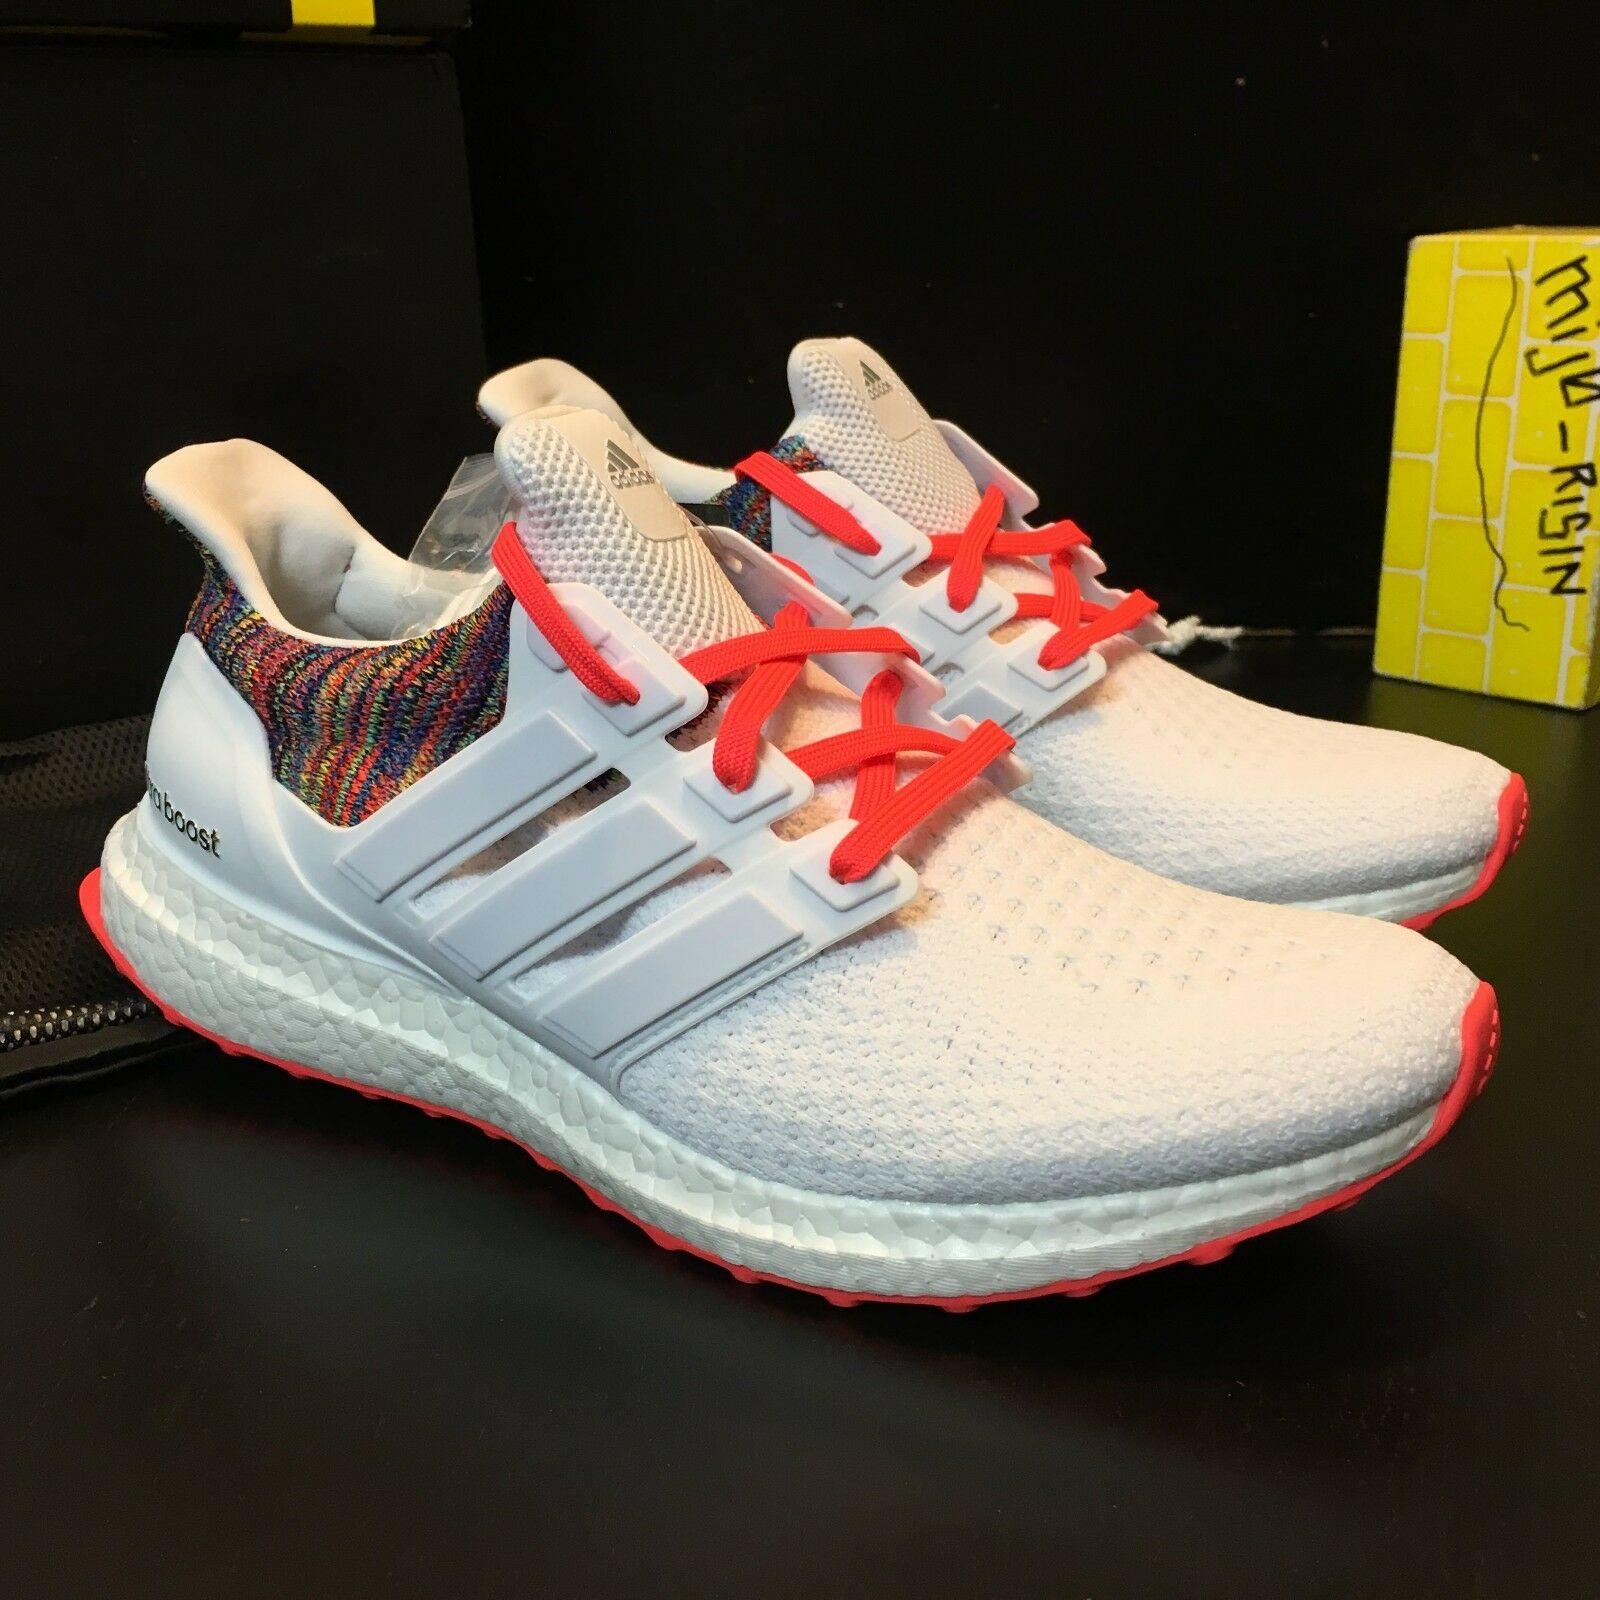 Brand New Adidas Ultra Boost Boost Boost 2.0 MiAdidas Rainbow   White Men Size 9 e696e1